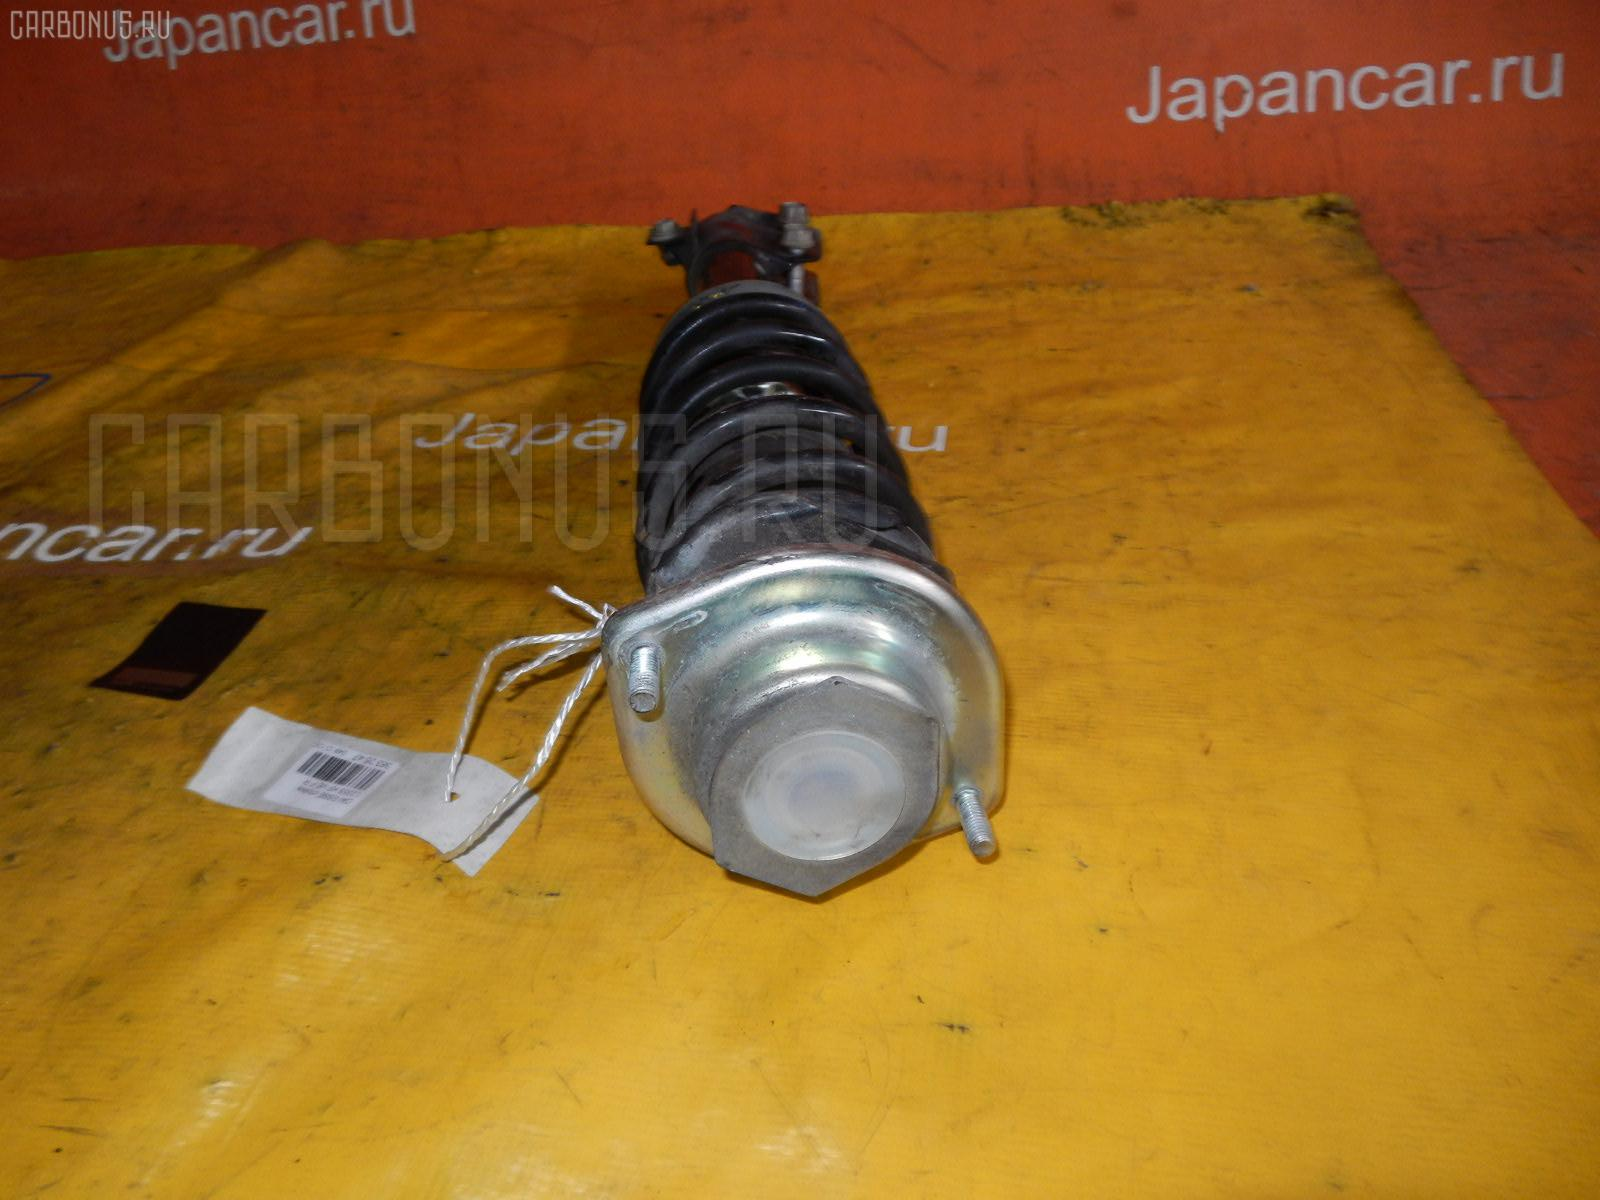 Стойка амортизатора DAIHATSU ESSE L235S KF-VE Фото 1